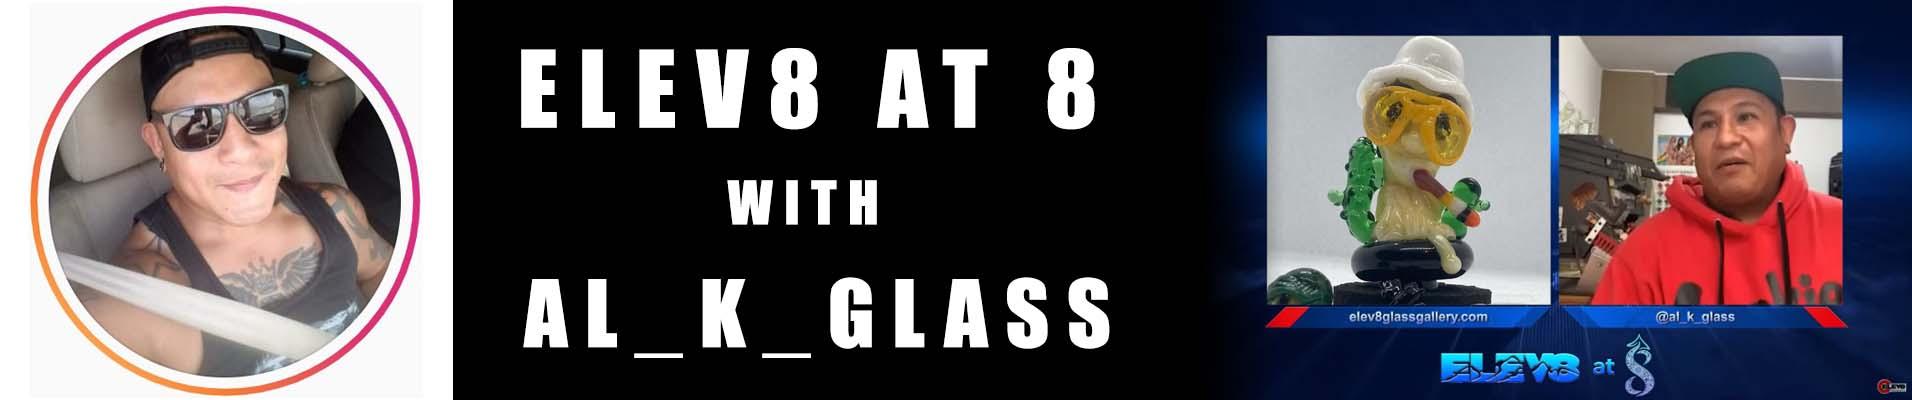 al-k-glass-elev8-at-8-banner.jpg